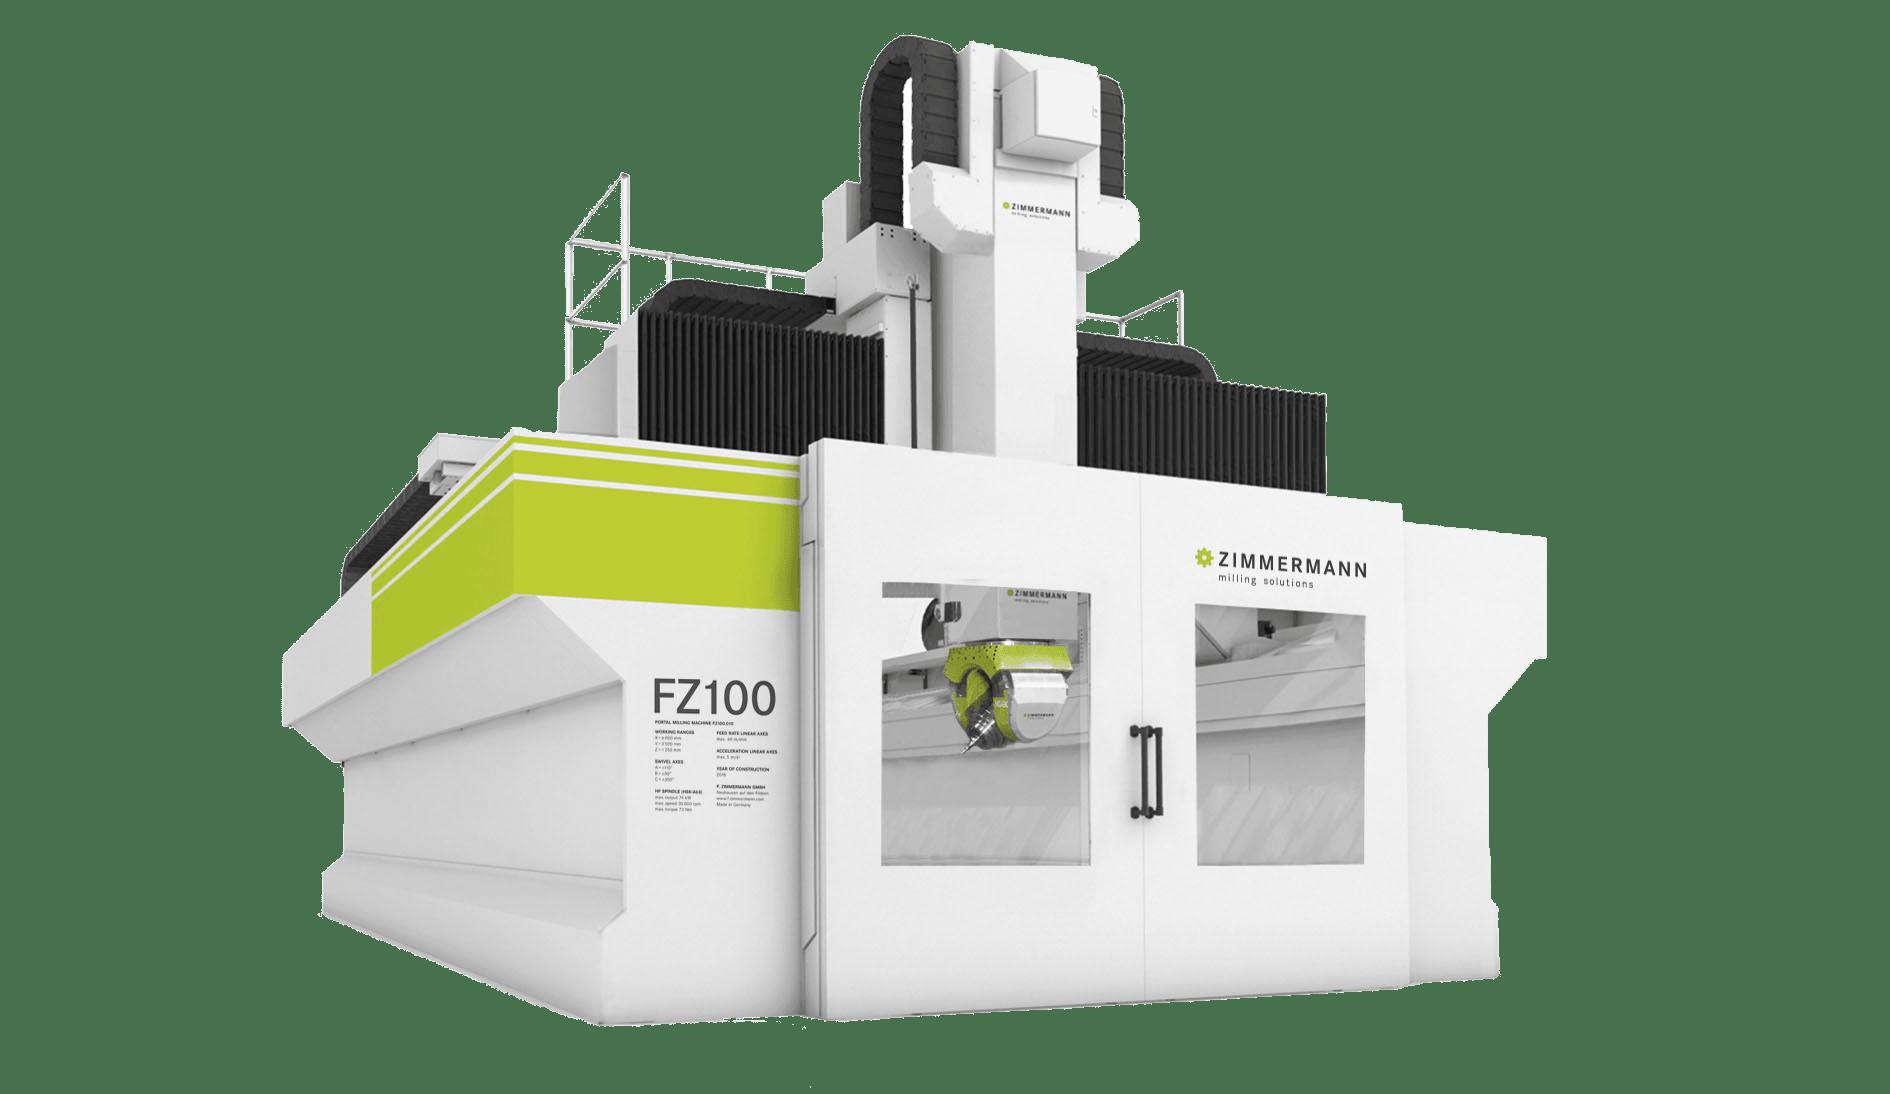 FZ100